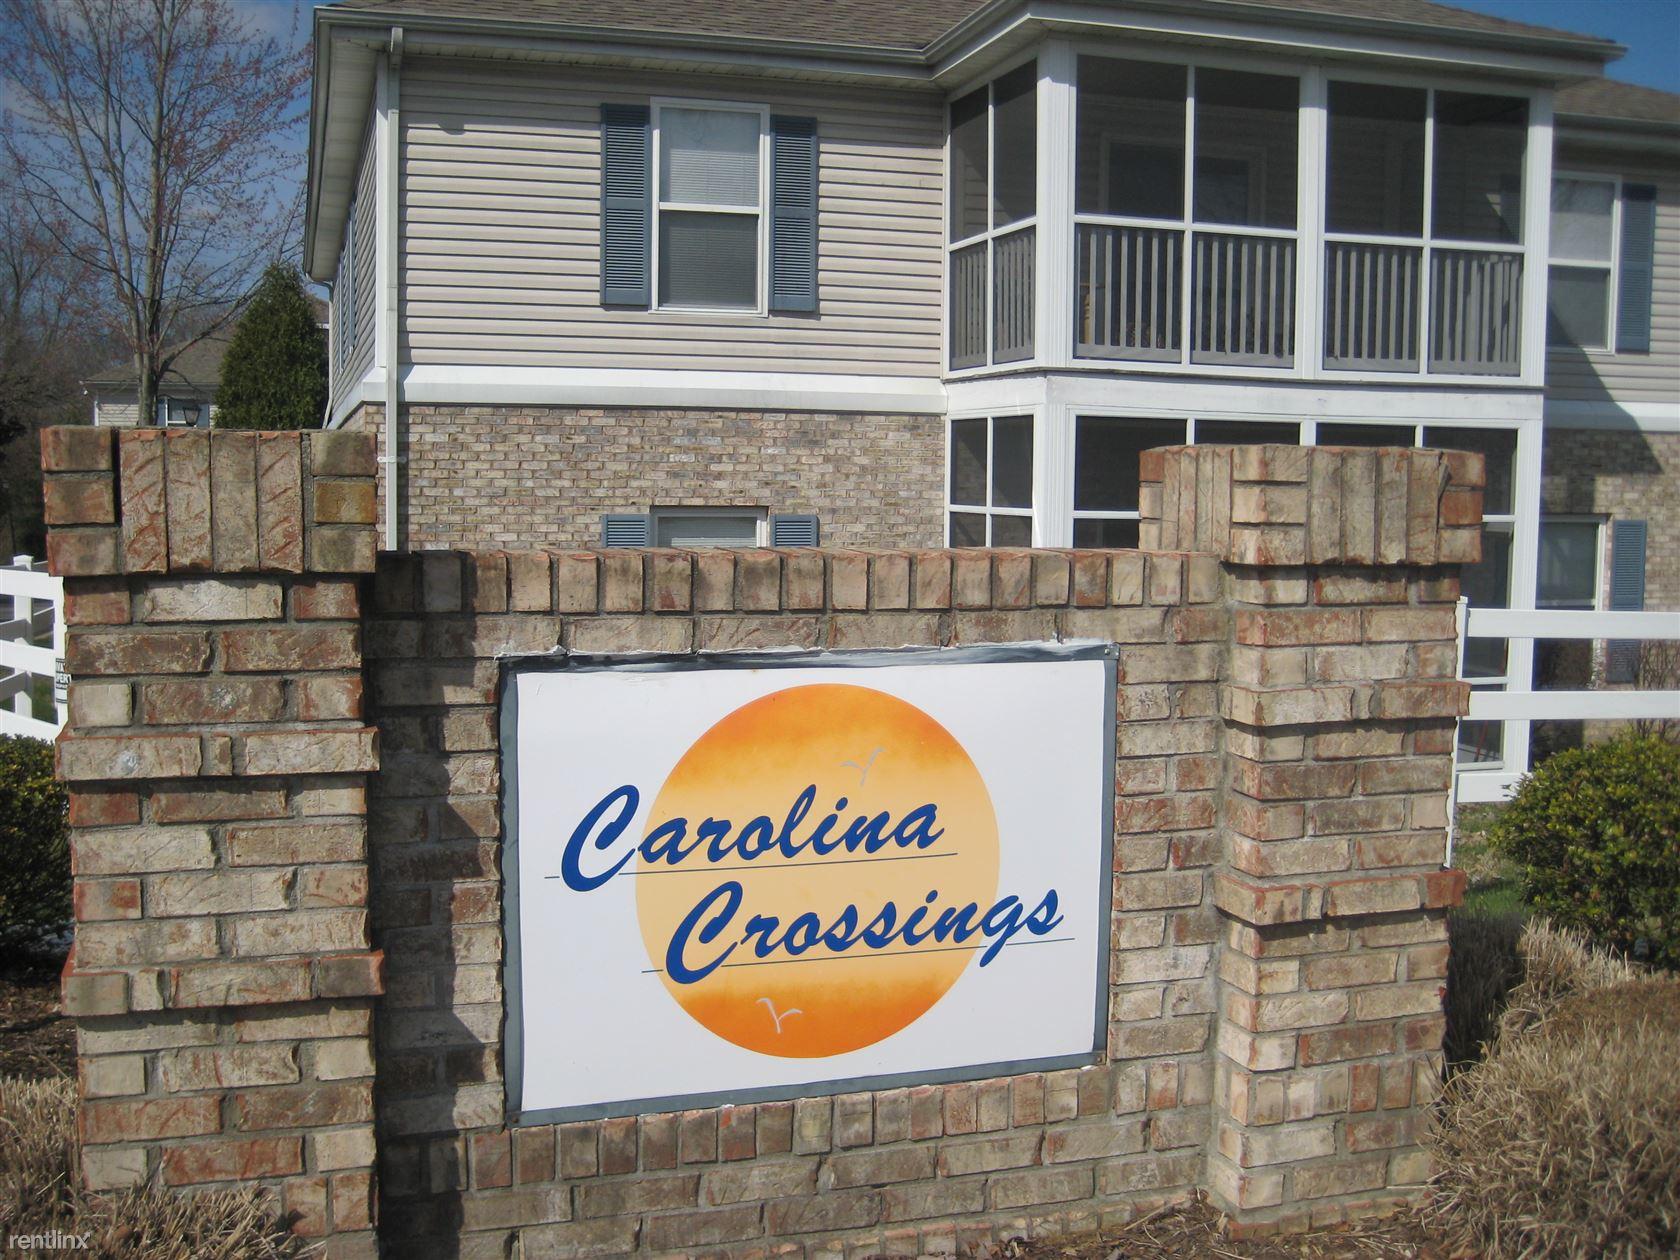 Condo for Rent in Louisville